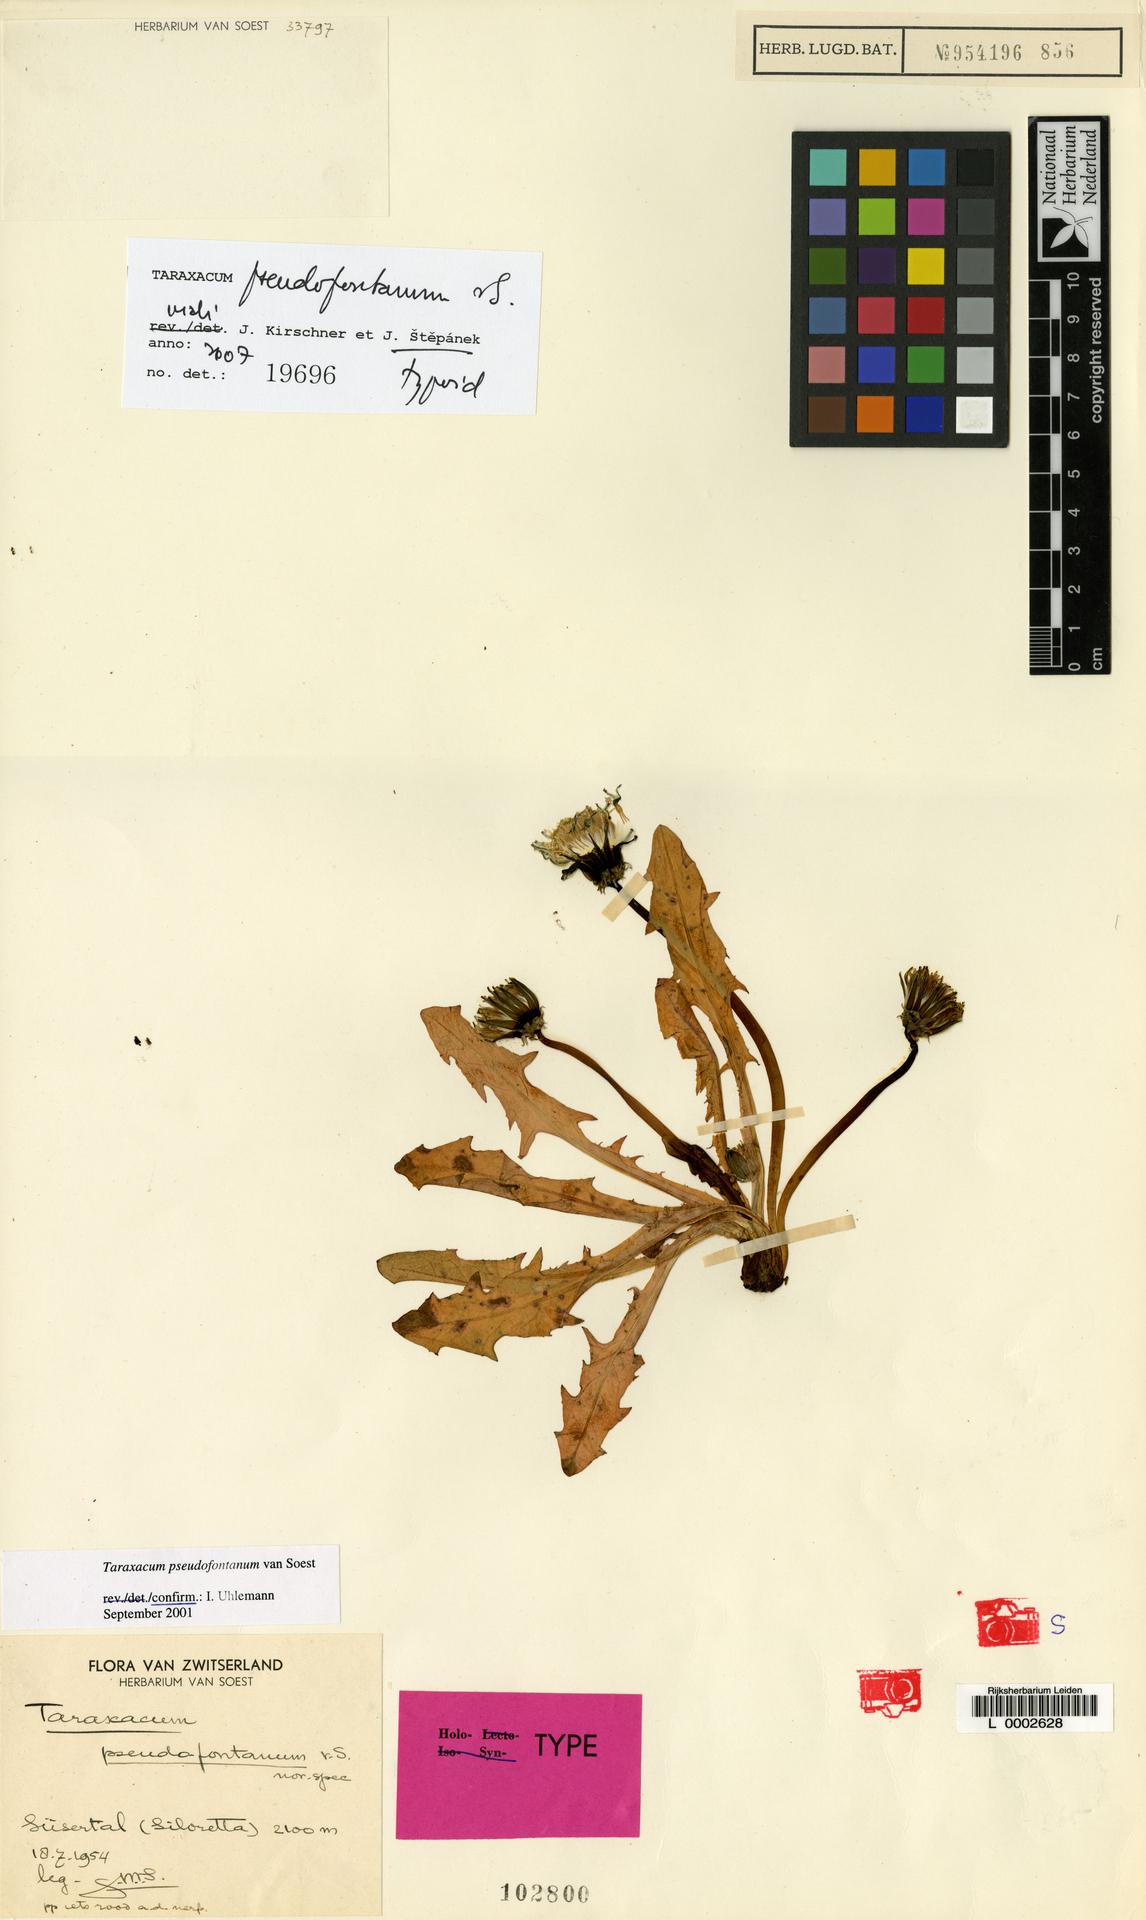 L  0002628 | Taraxacum pseudofontanum Soest